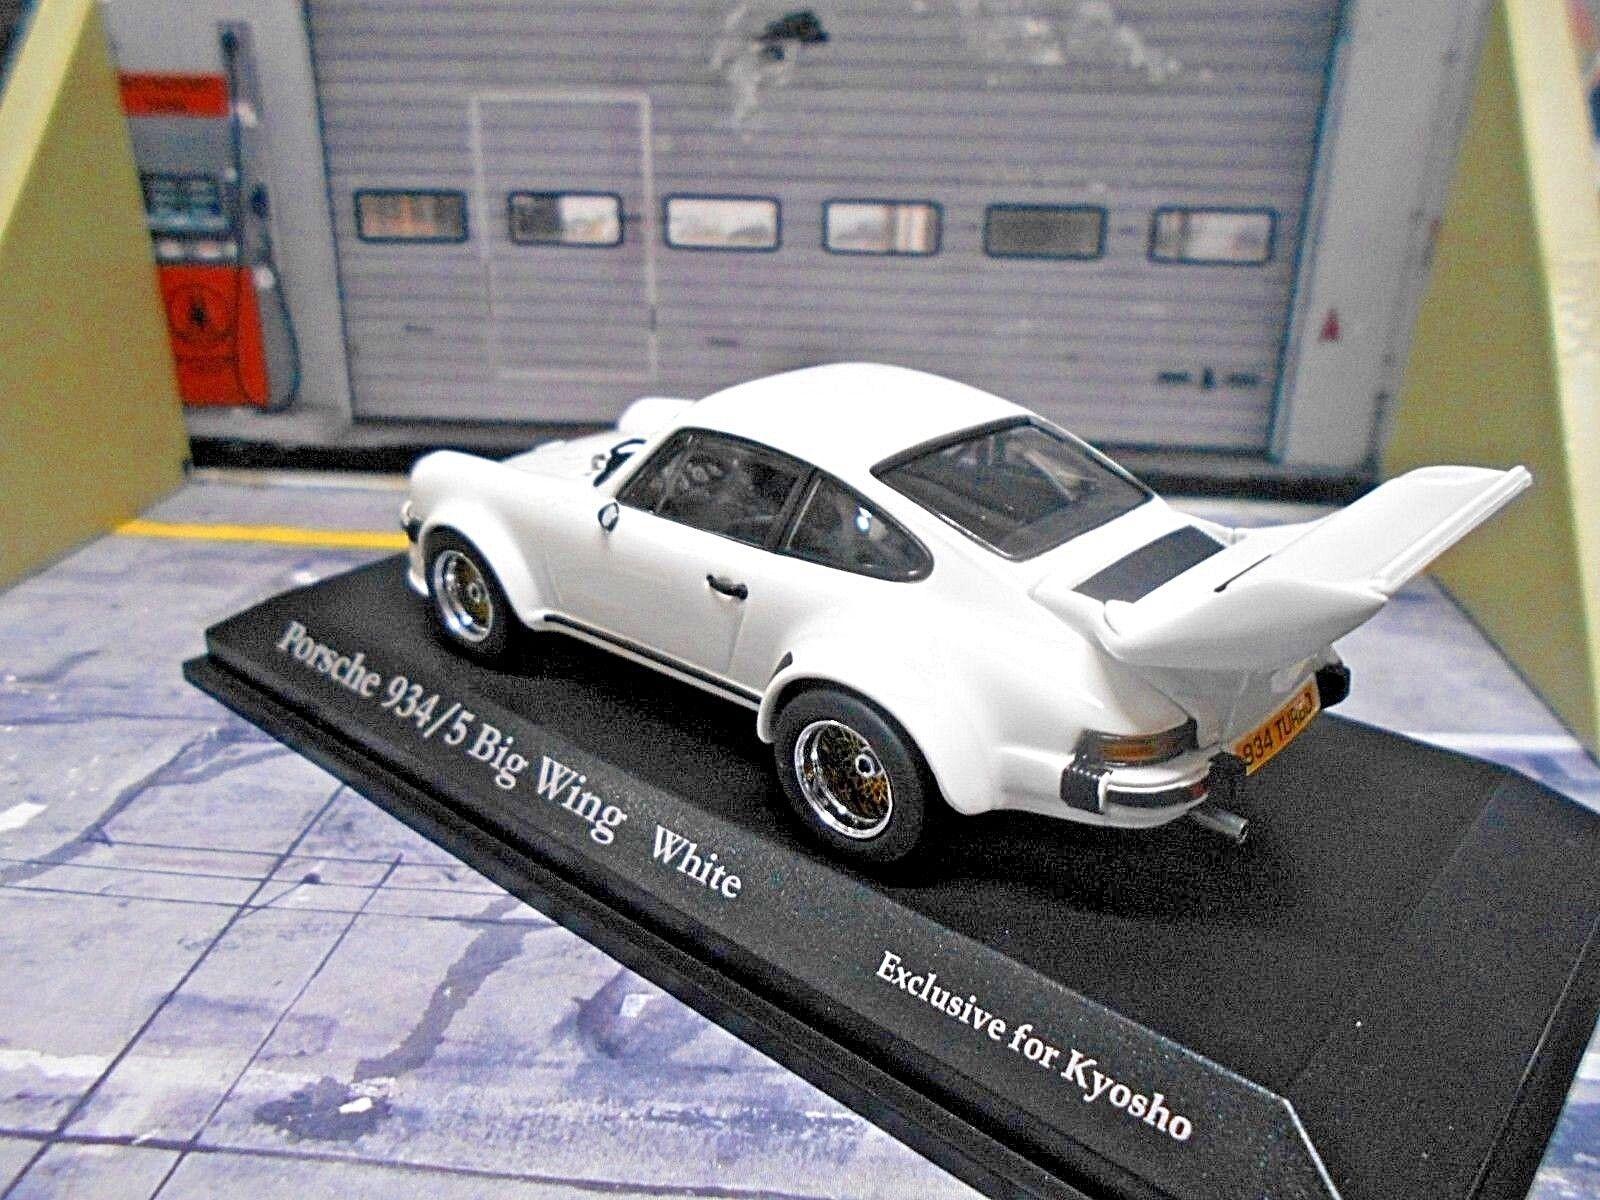 Porsche 911 934 5 934 5 BIG BIG BIG WING Blanc blanc Racing Street KYOSHO 1 43 932c95